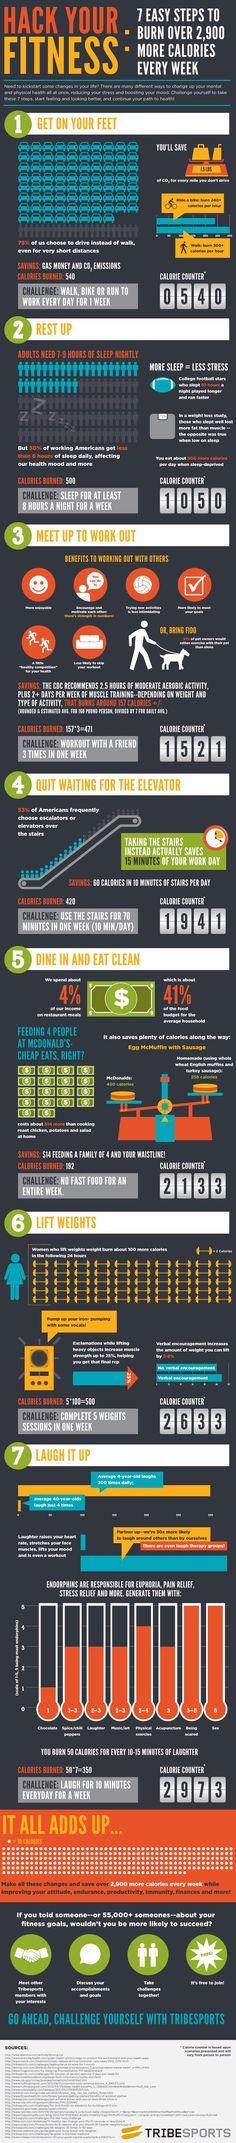 11 Simple Ways to Burn 3000 Extra Calories a Week